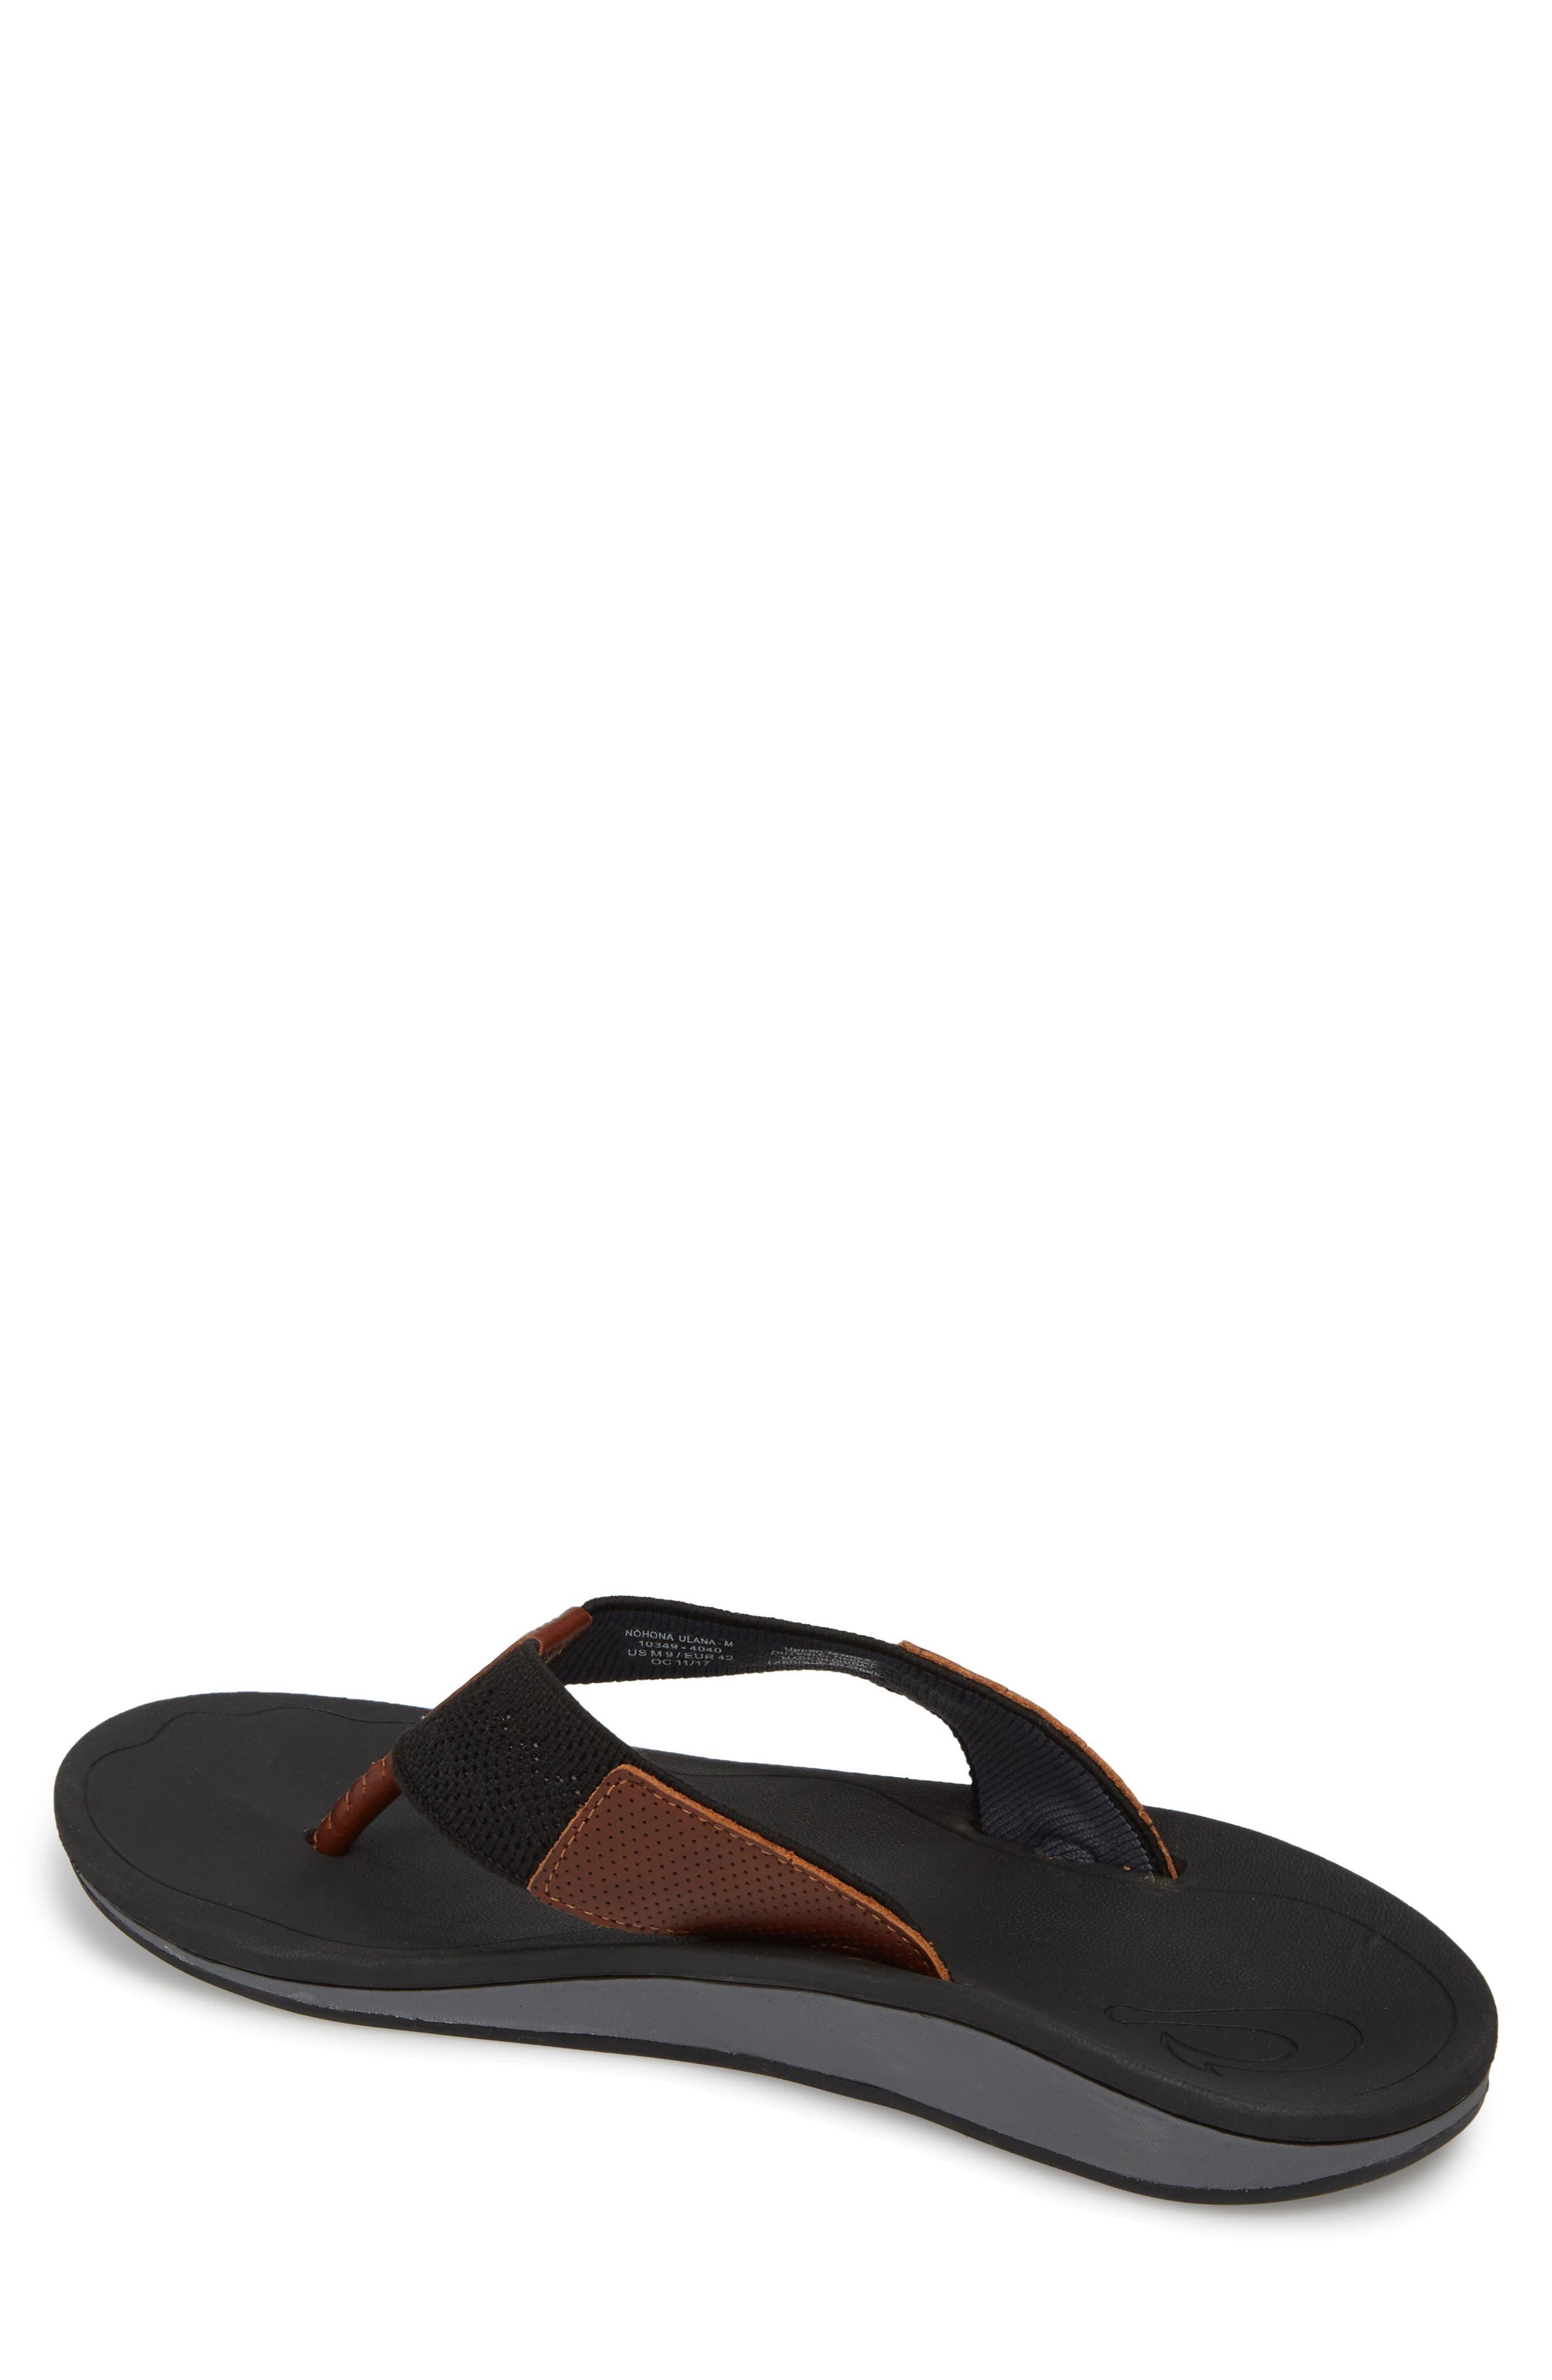 Nohona Ulana Flip Flop,                             Alternate thumbnail 2, color,                             Black/ Black Leather